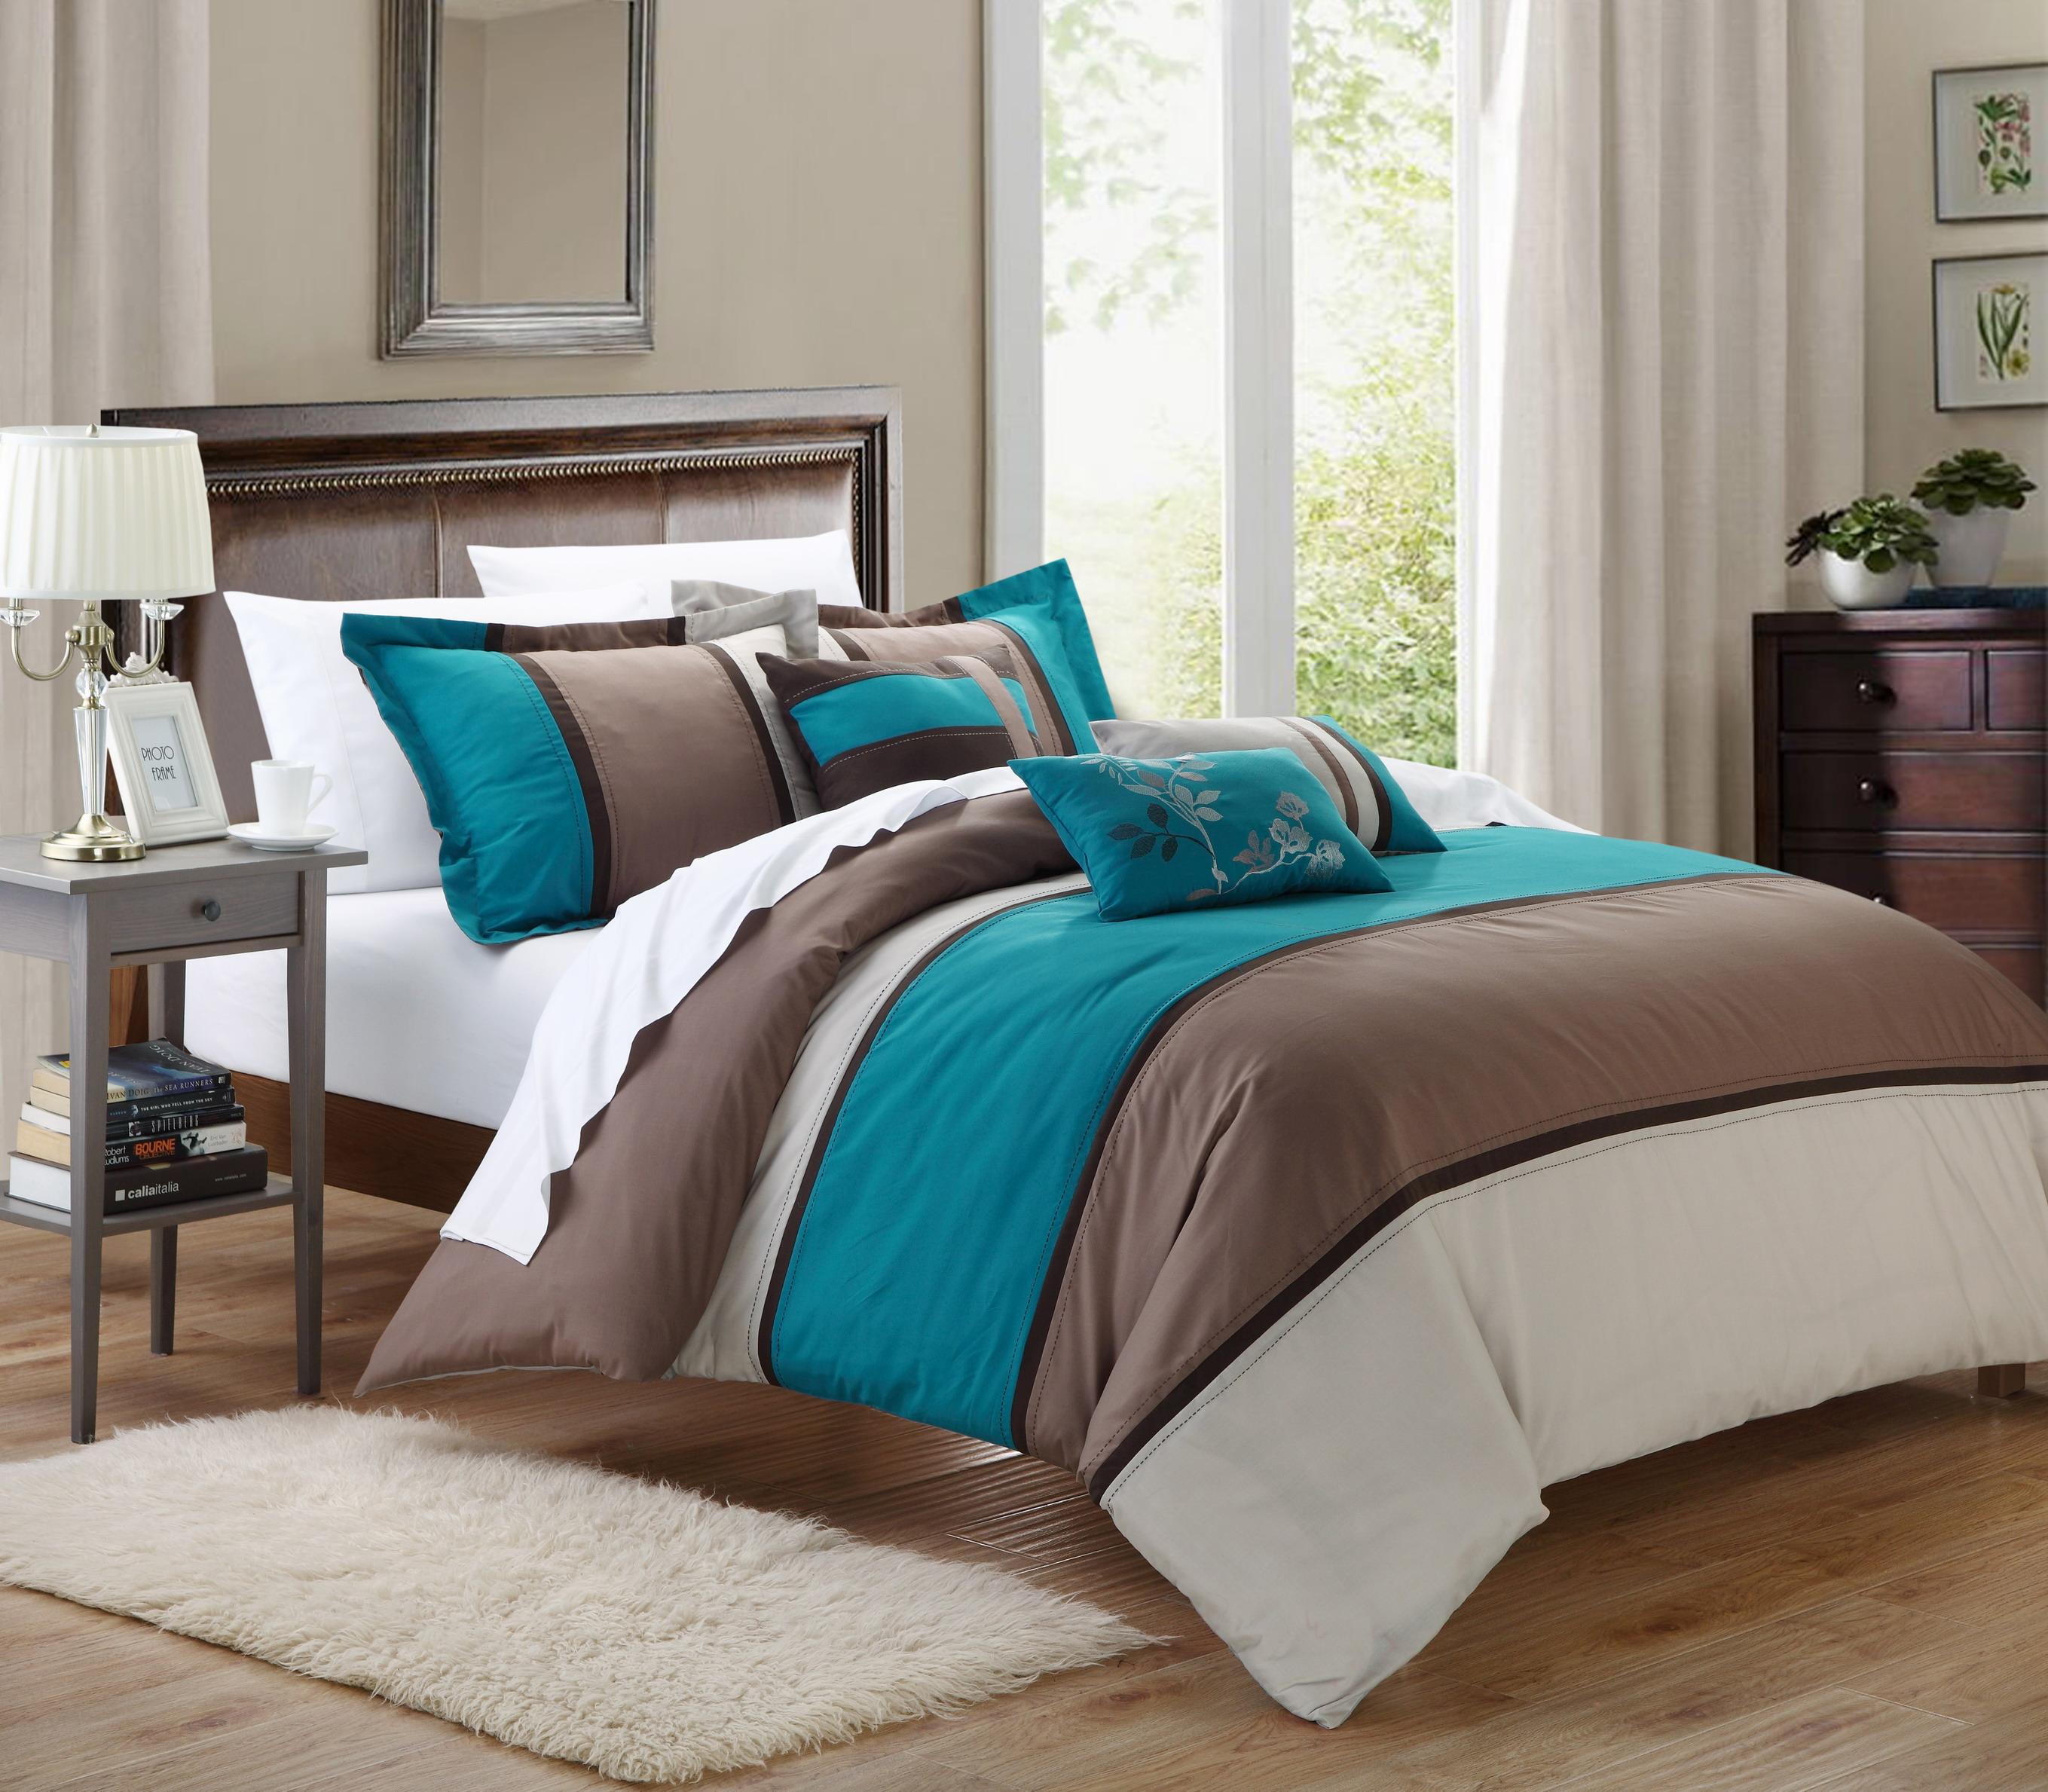 Chic Home Ballroom 11-piece Comforter Set King Size Teal